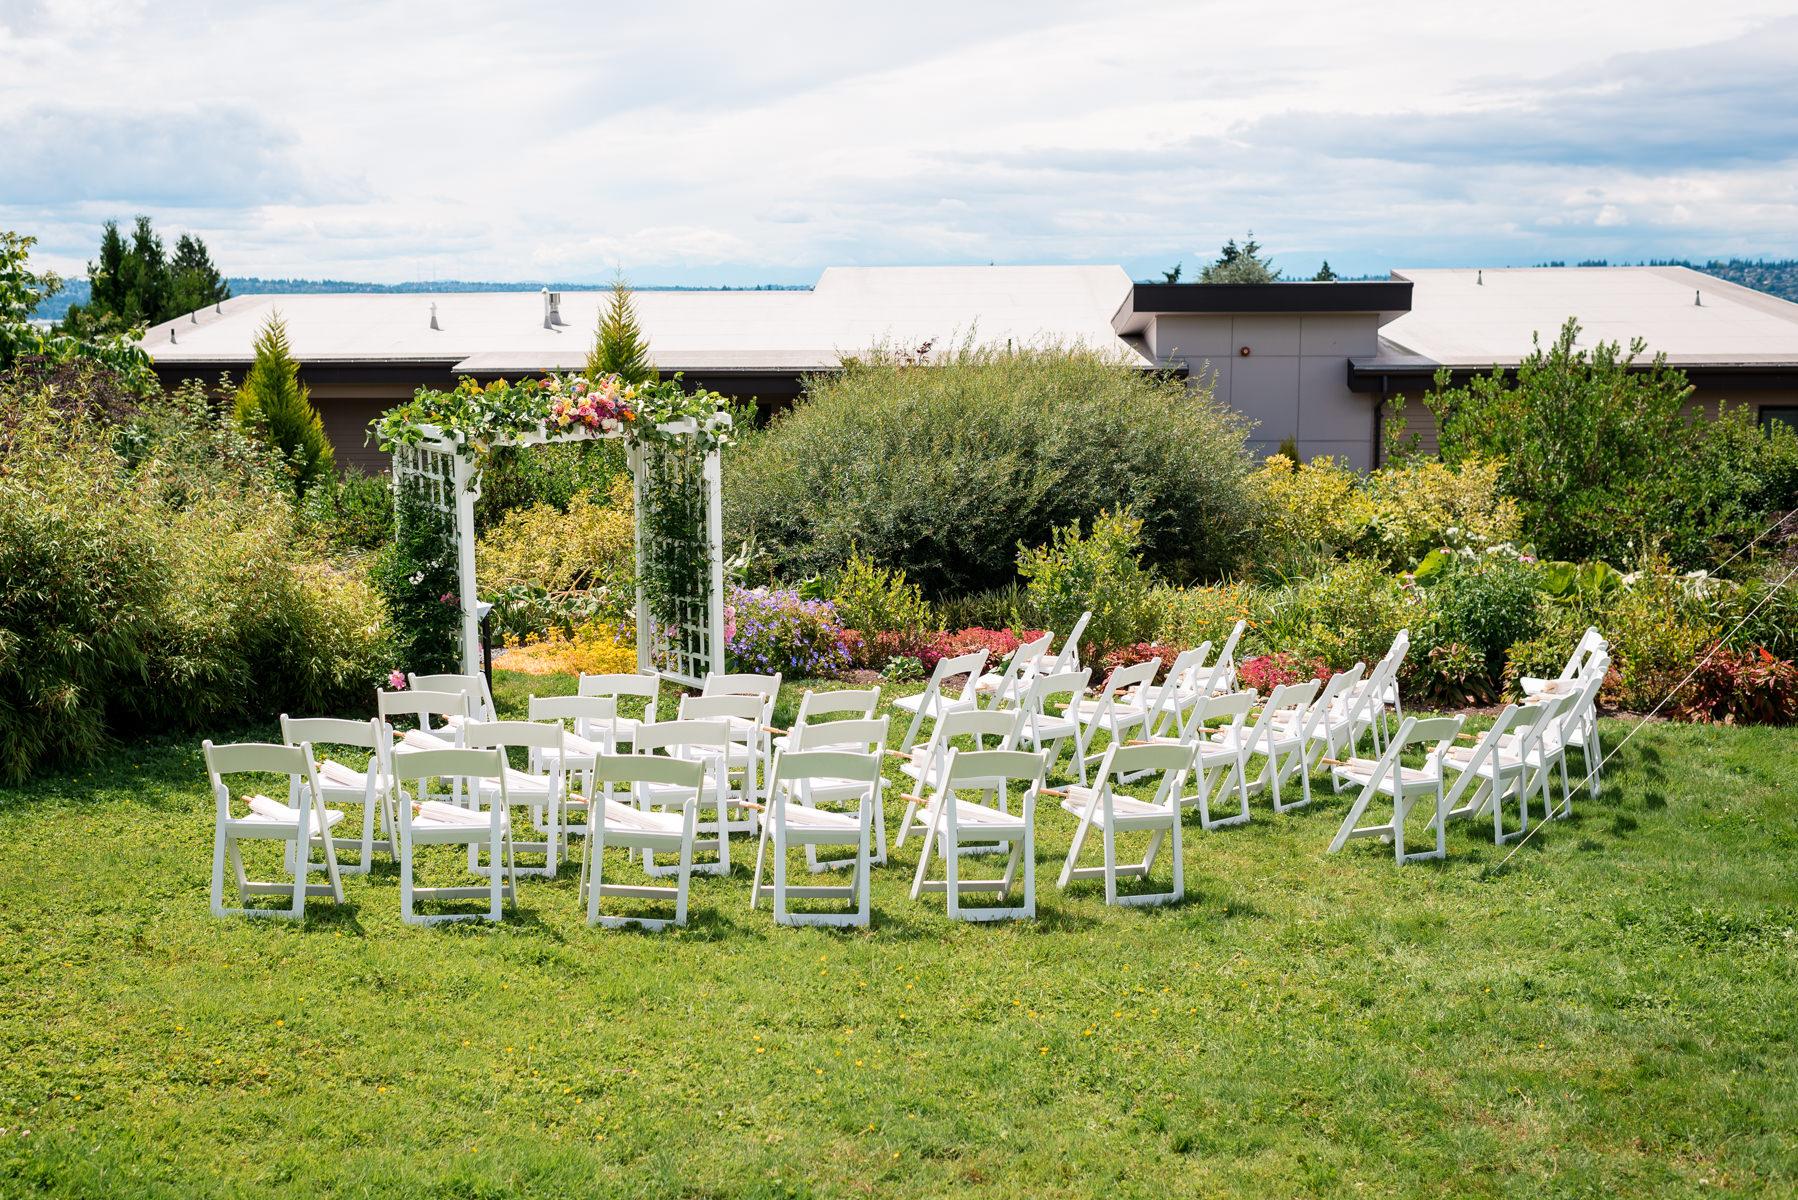 Andrew Tat - Documentary Wedding Photography - Kirkland, Washington - Emily & Cuauh - 01.JPG